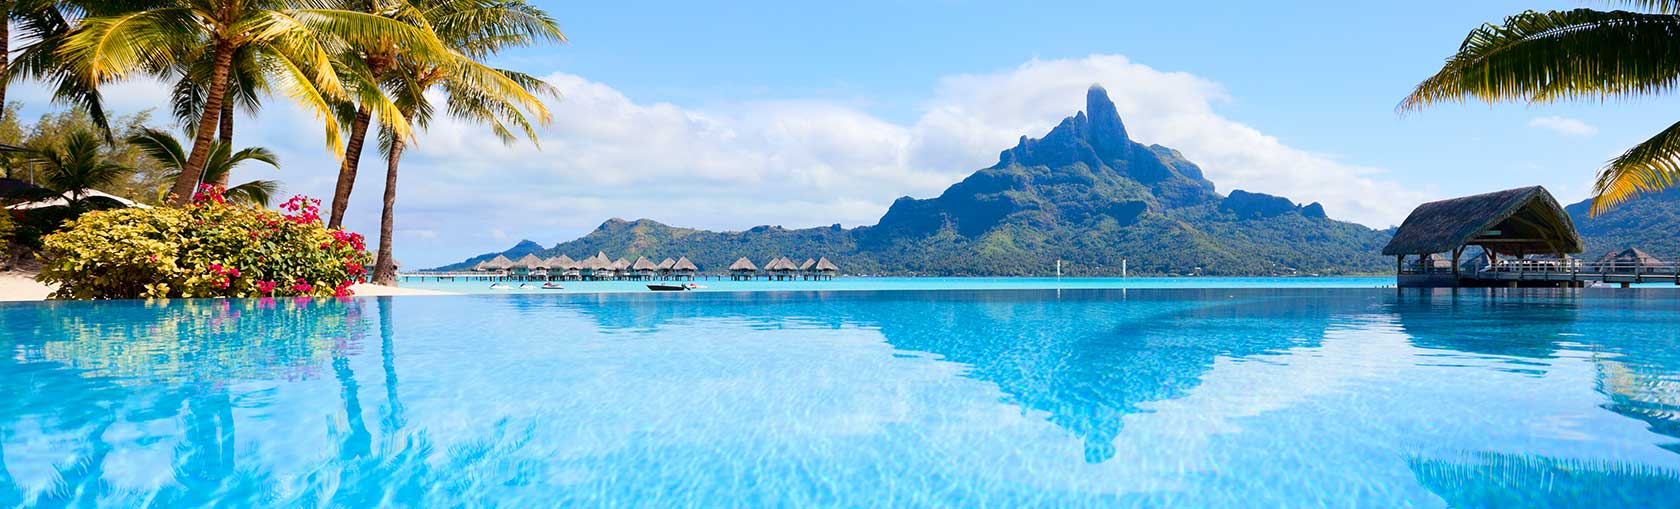 destinations south pacific tahiti